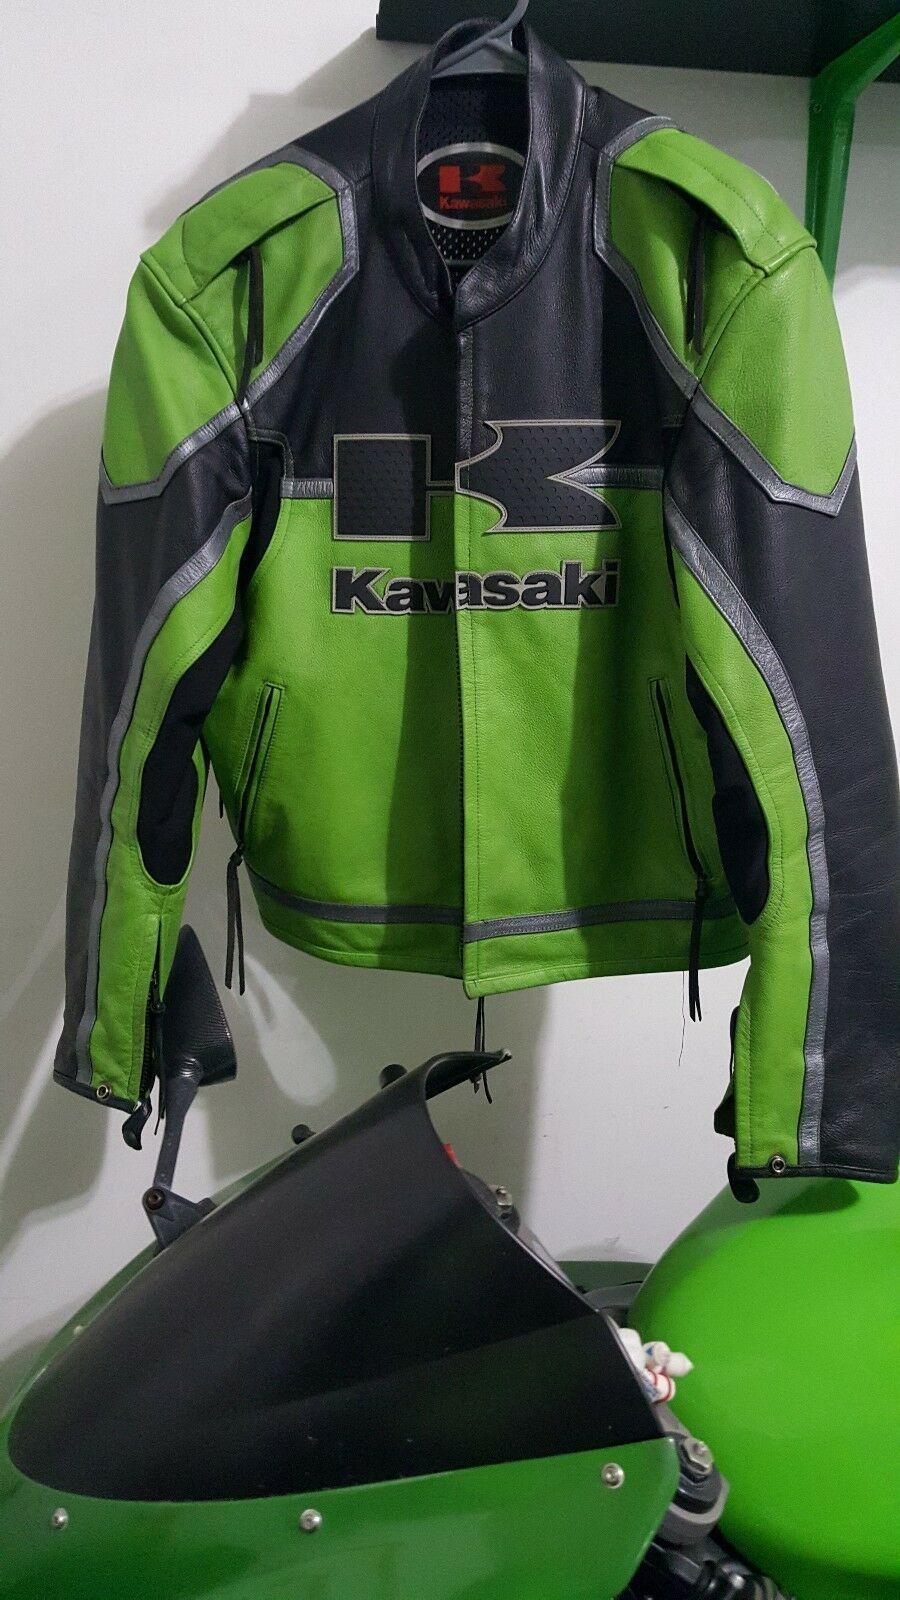 Kawasaki Two Tone Green Black Racing Motorbike Genuine